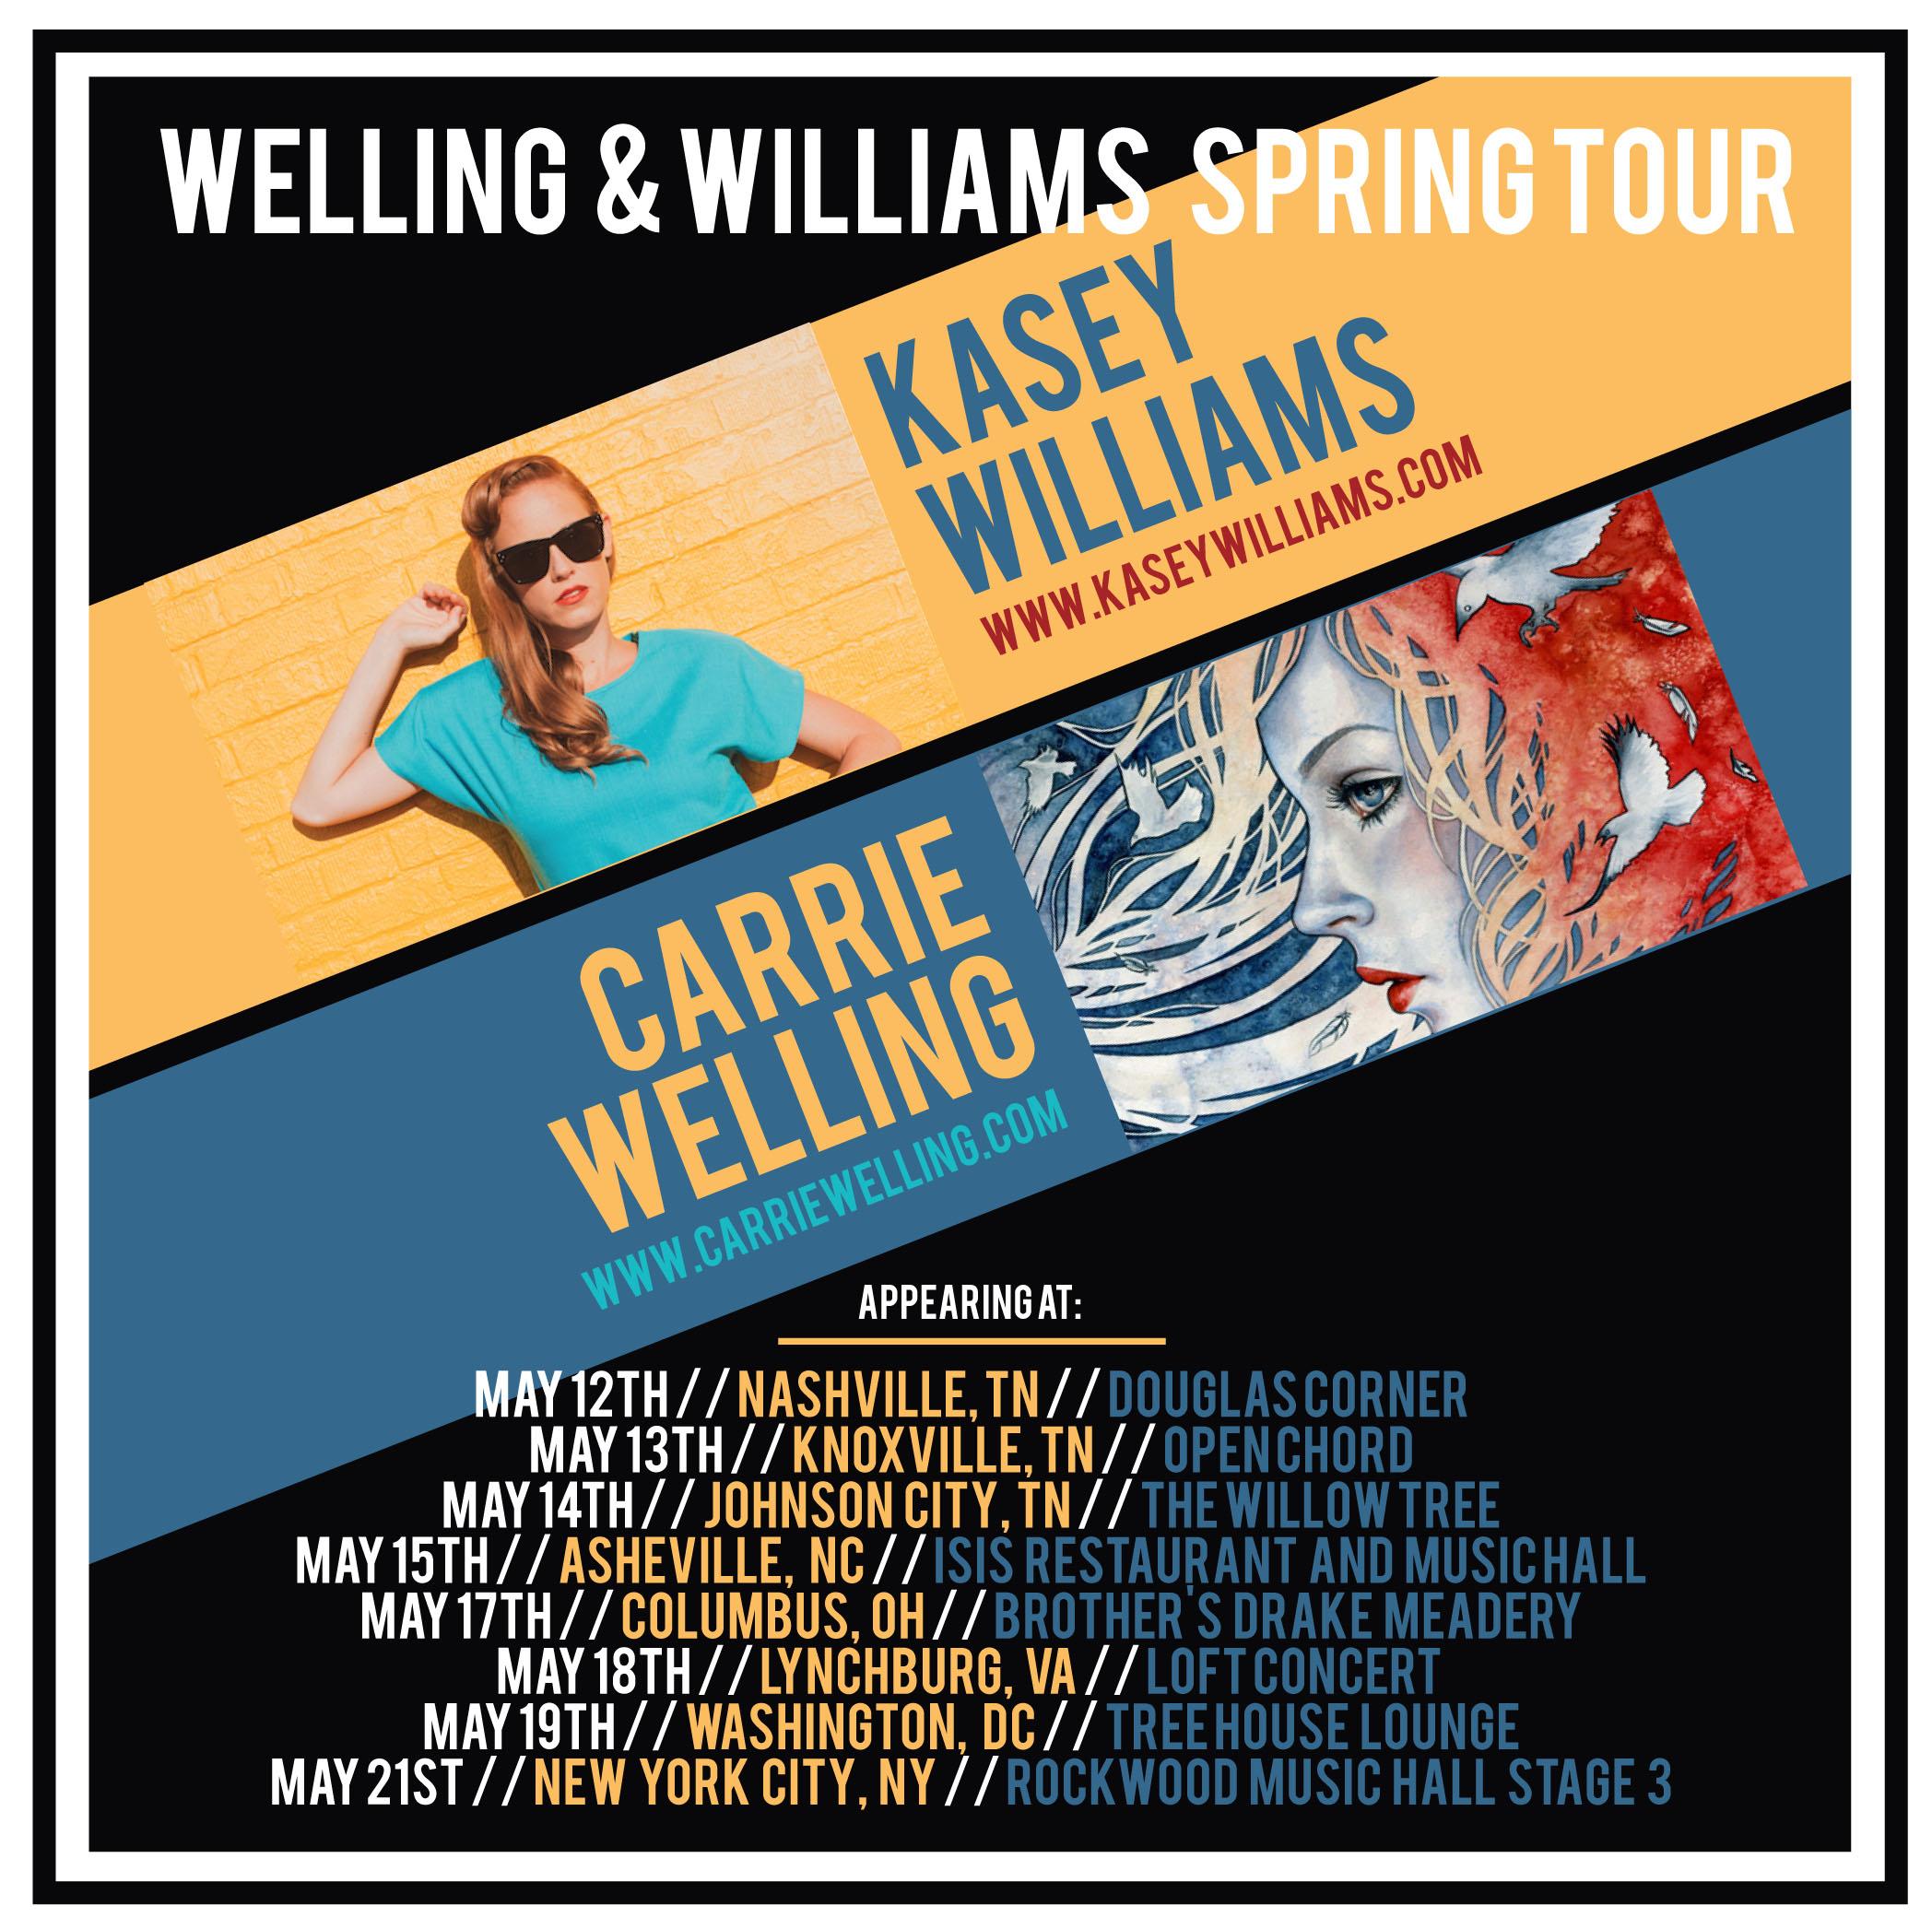 WellingWilliamsSpringTour v2 HD.jpg